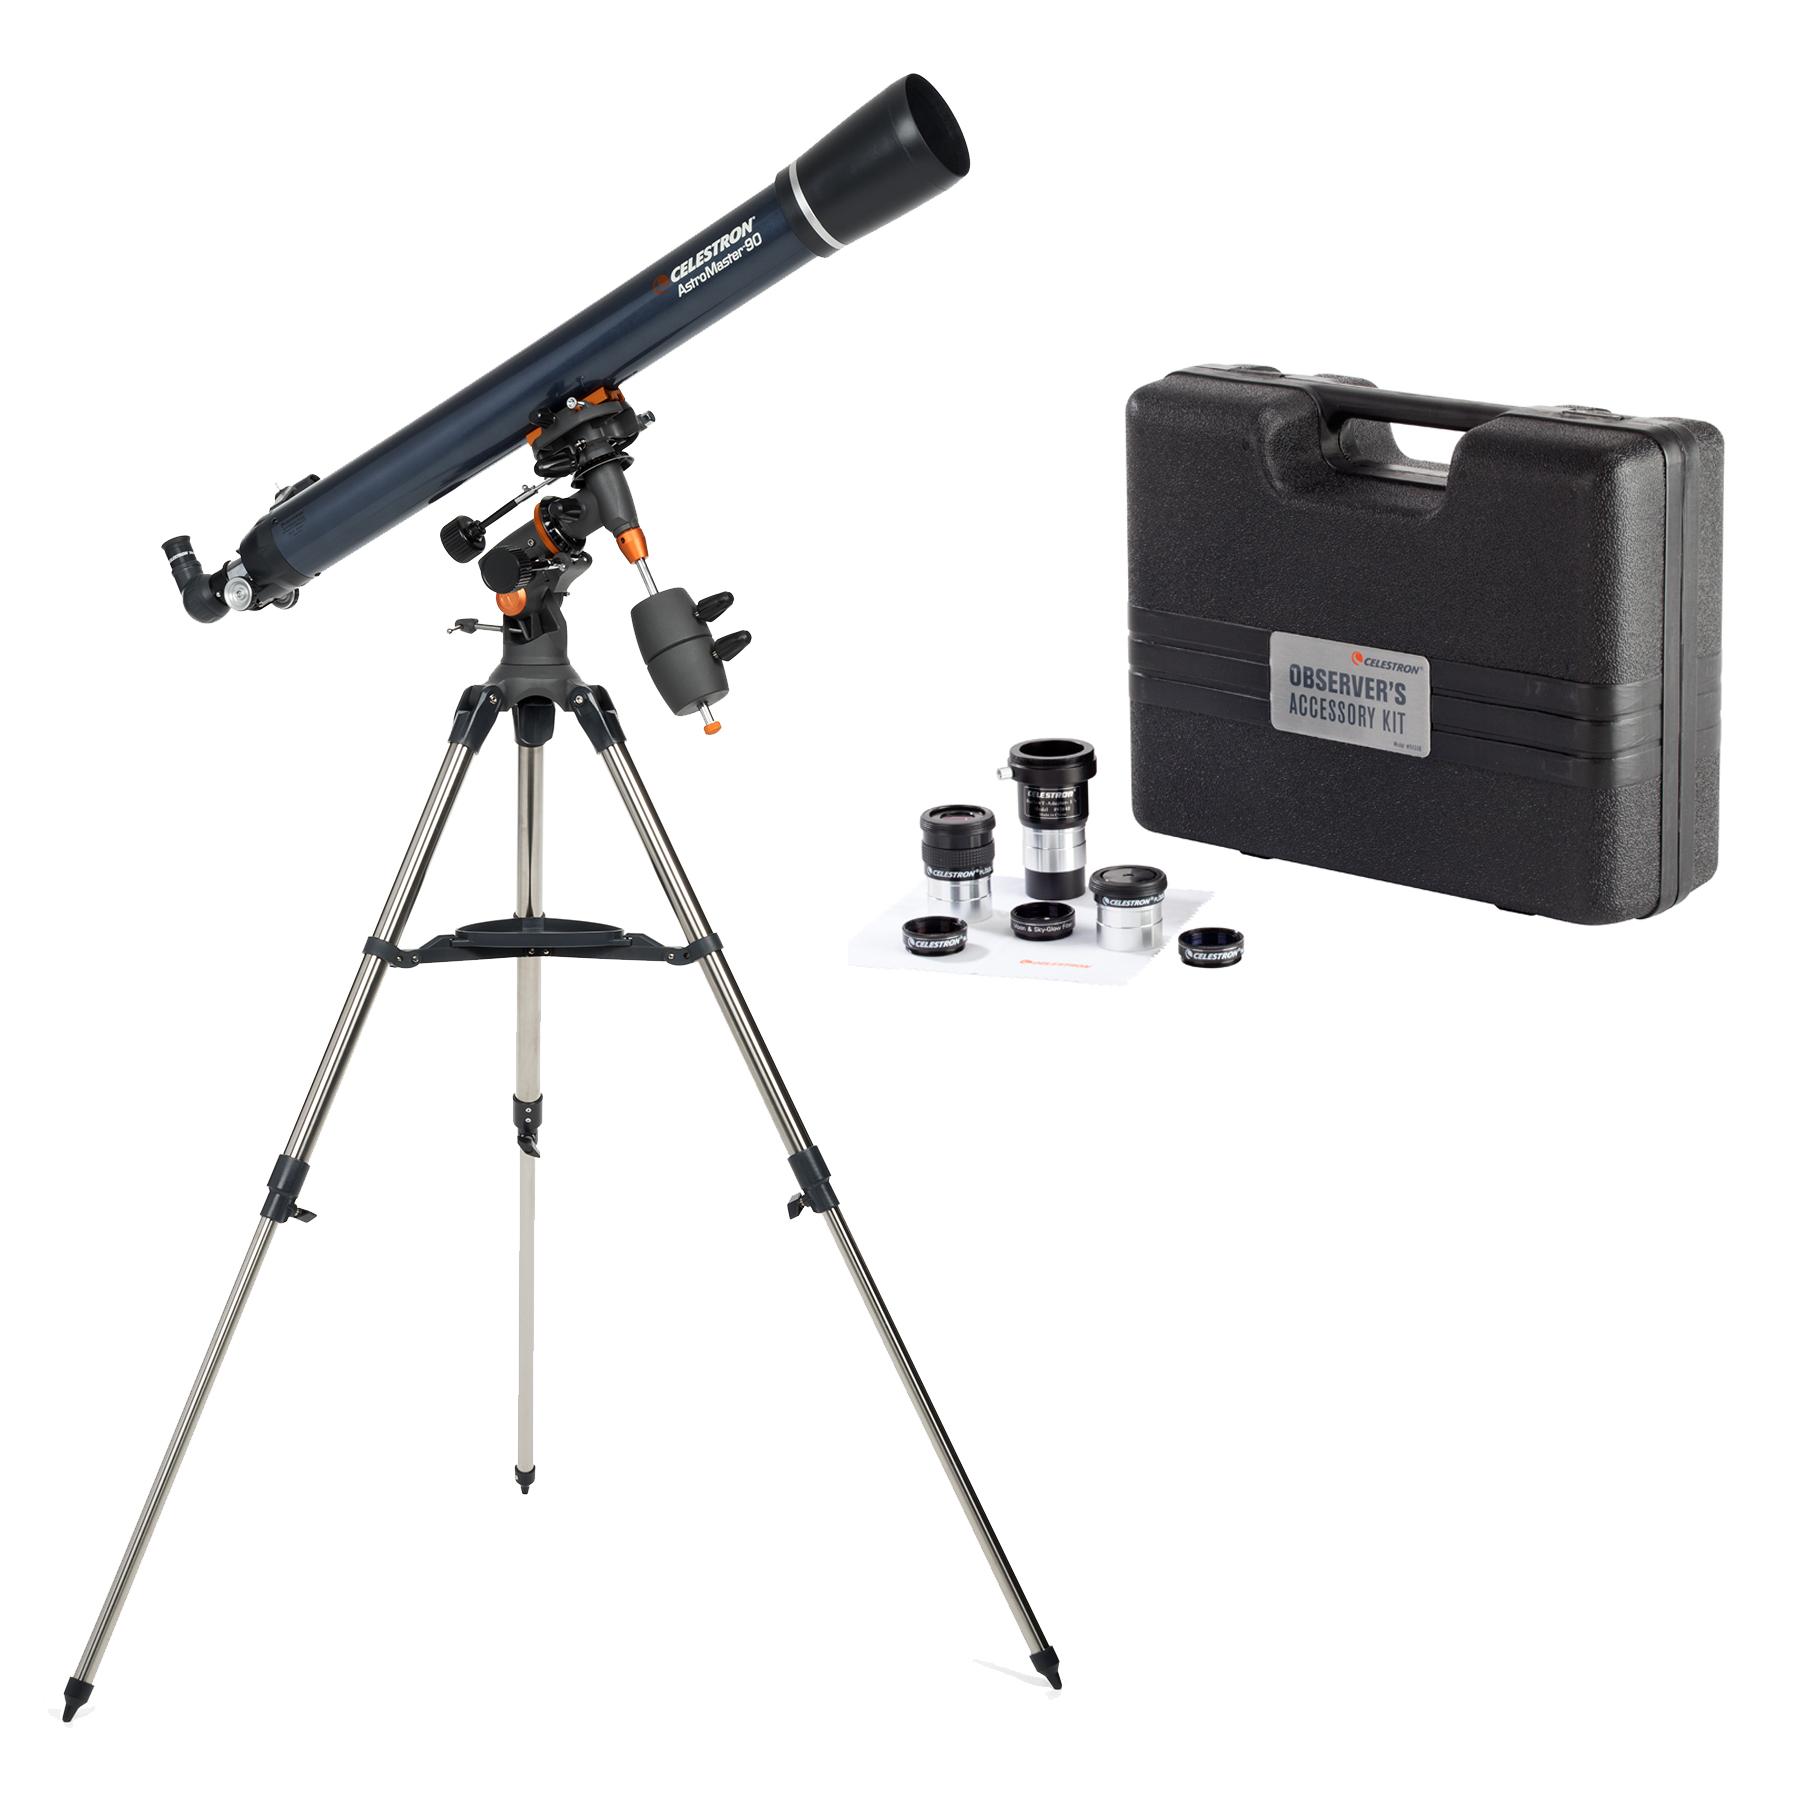 Celestron AstroMaster 90EQ Telescope with Celestron Observers Accessory Kit